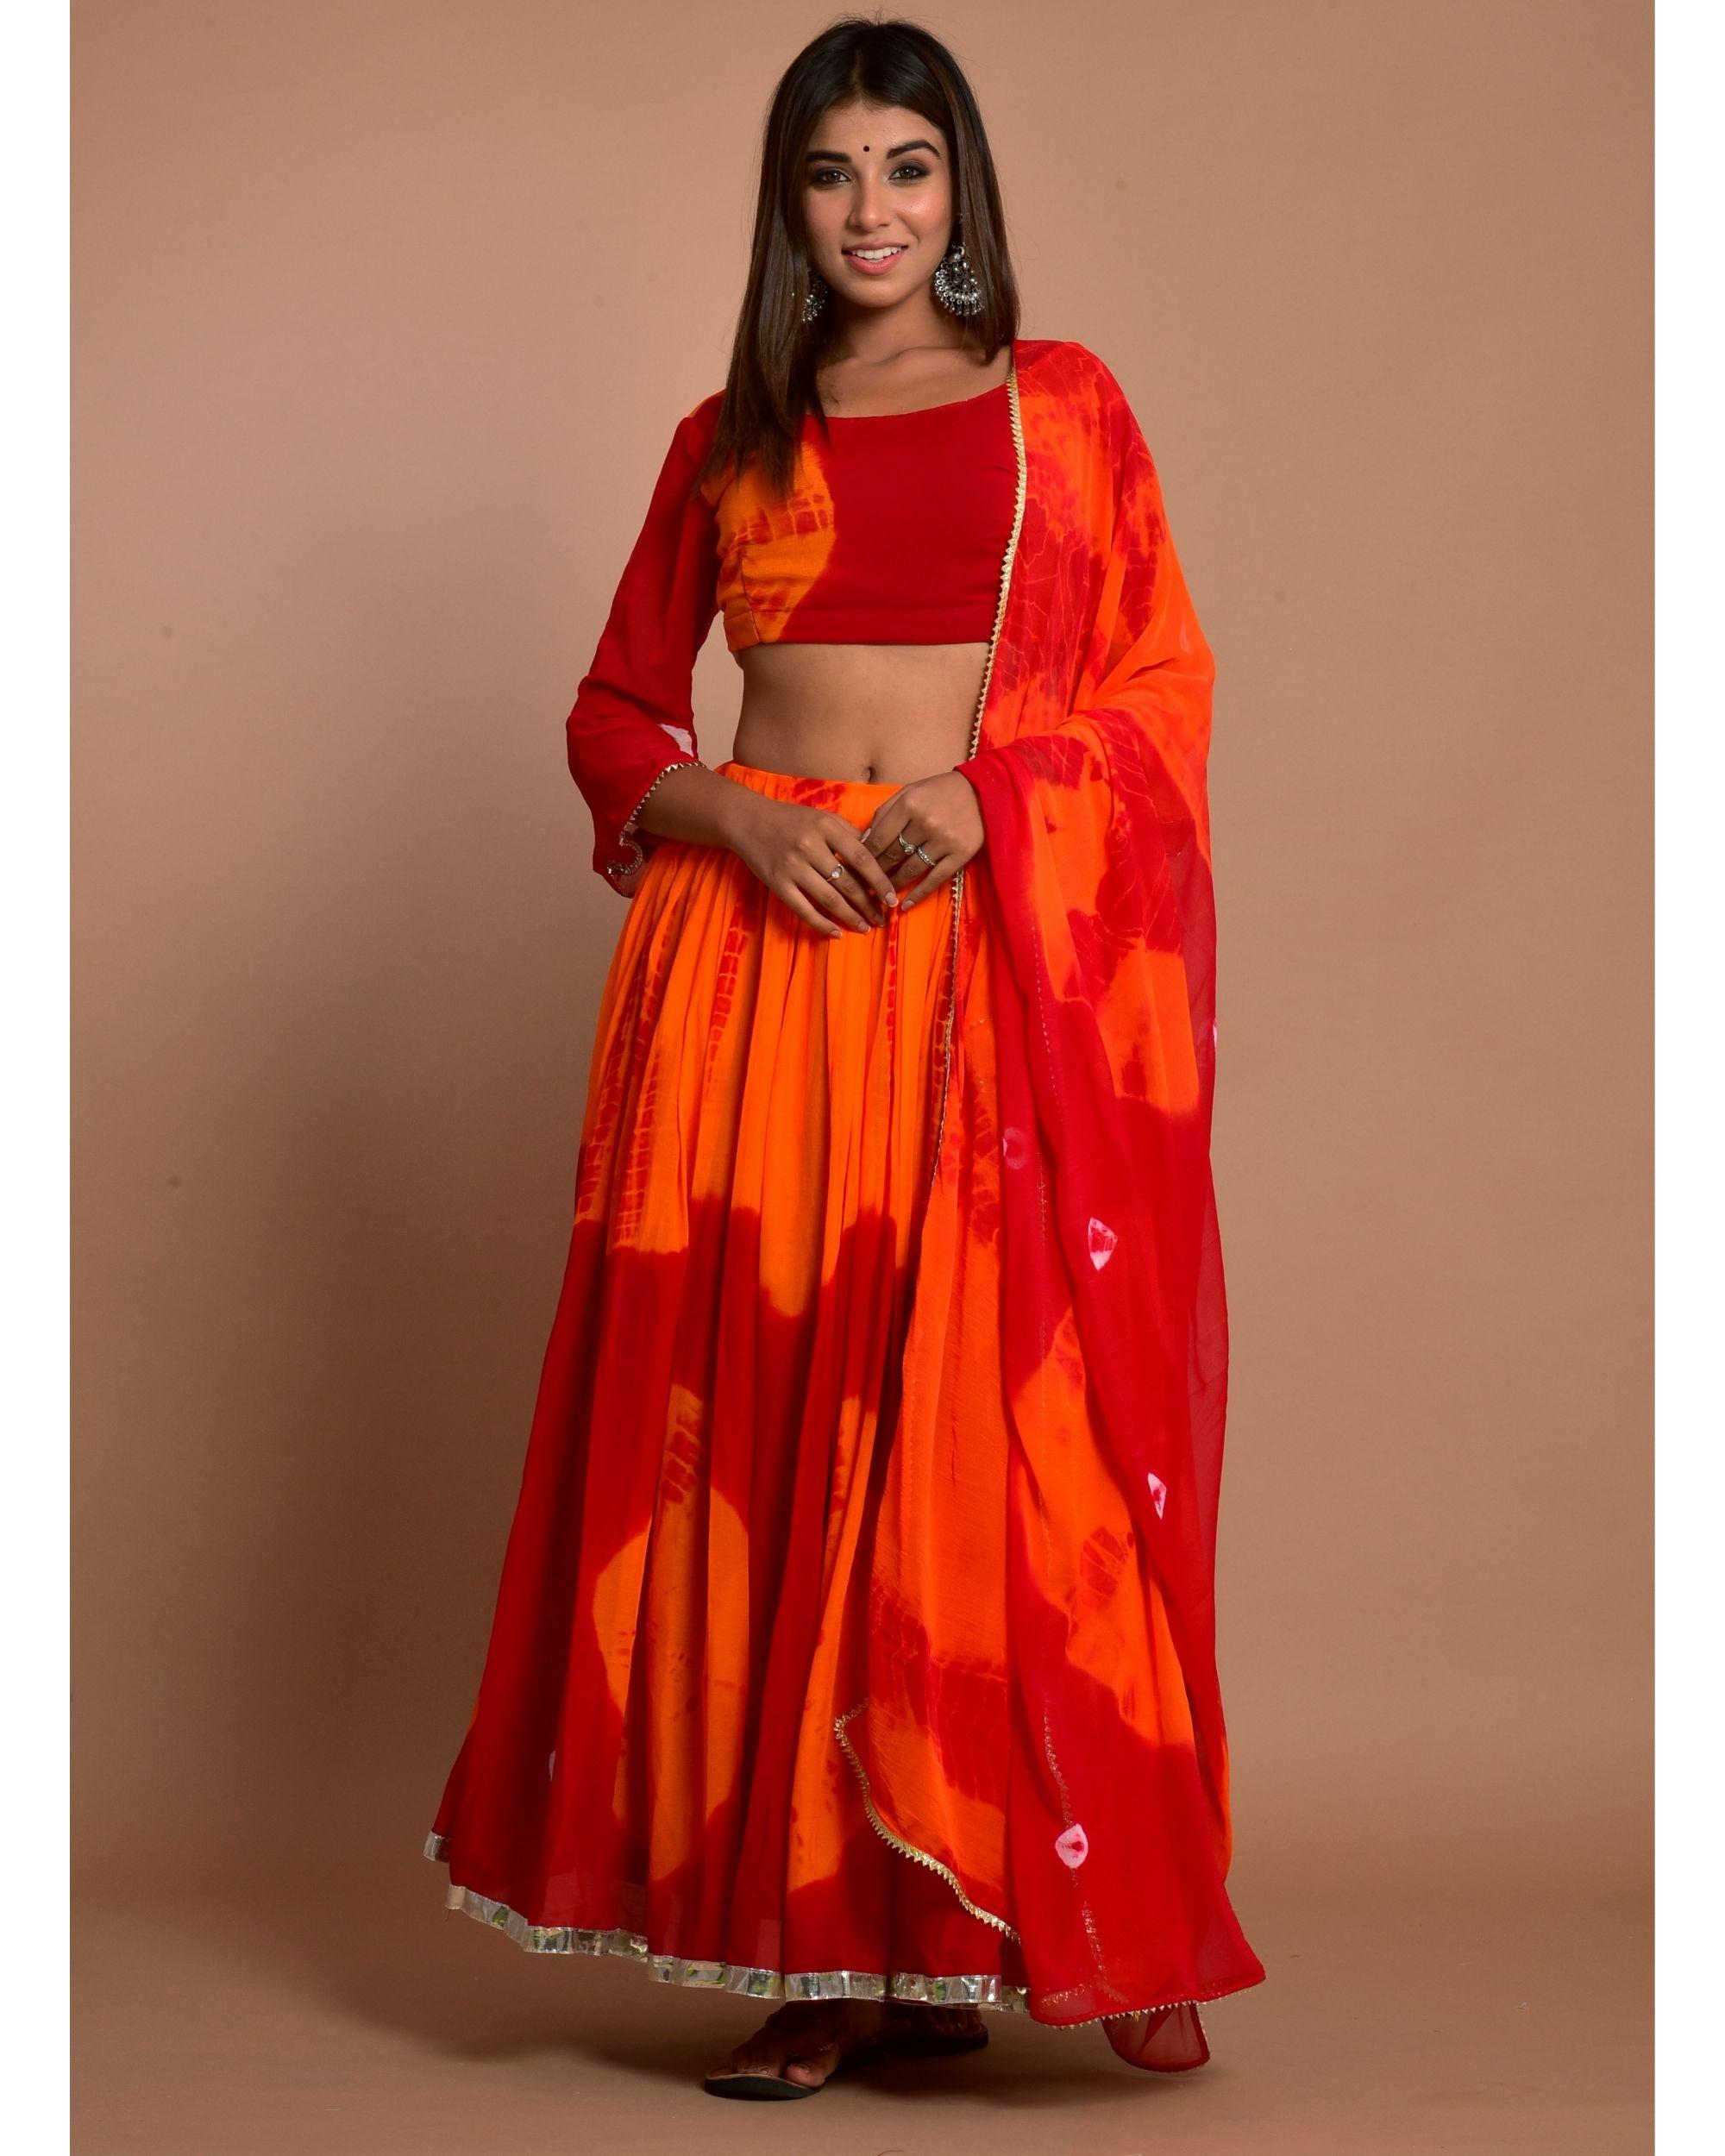 Marsala red tie and dye choli and lehenga with dupatta - Set Of Three